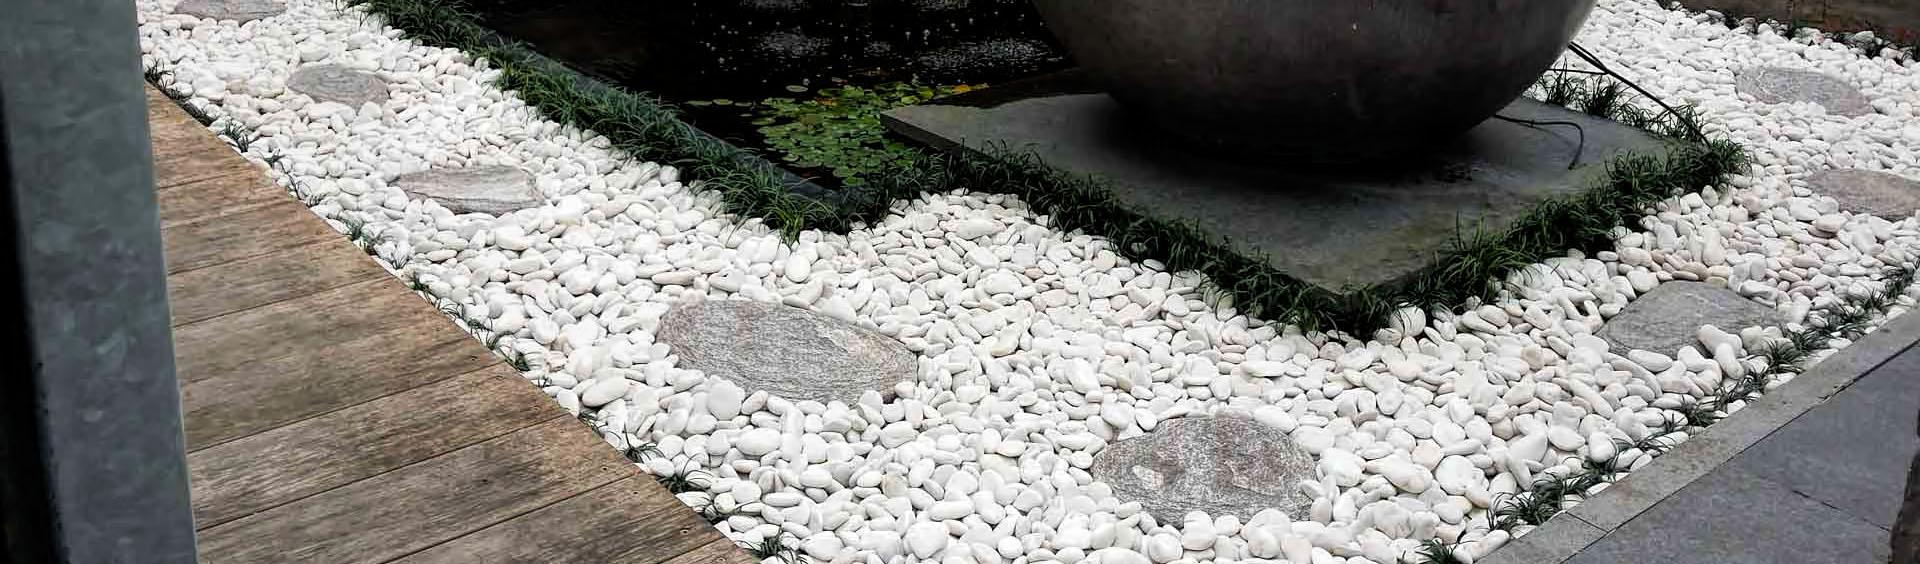 Garden Pebble Sydney